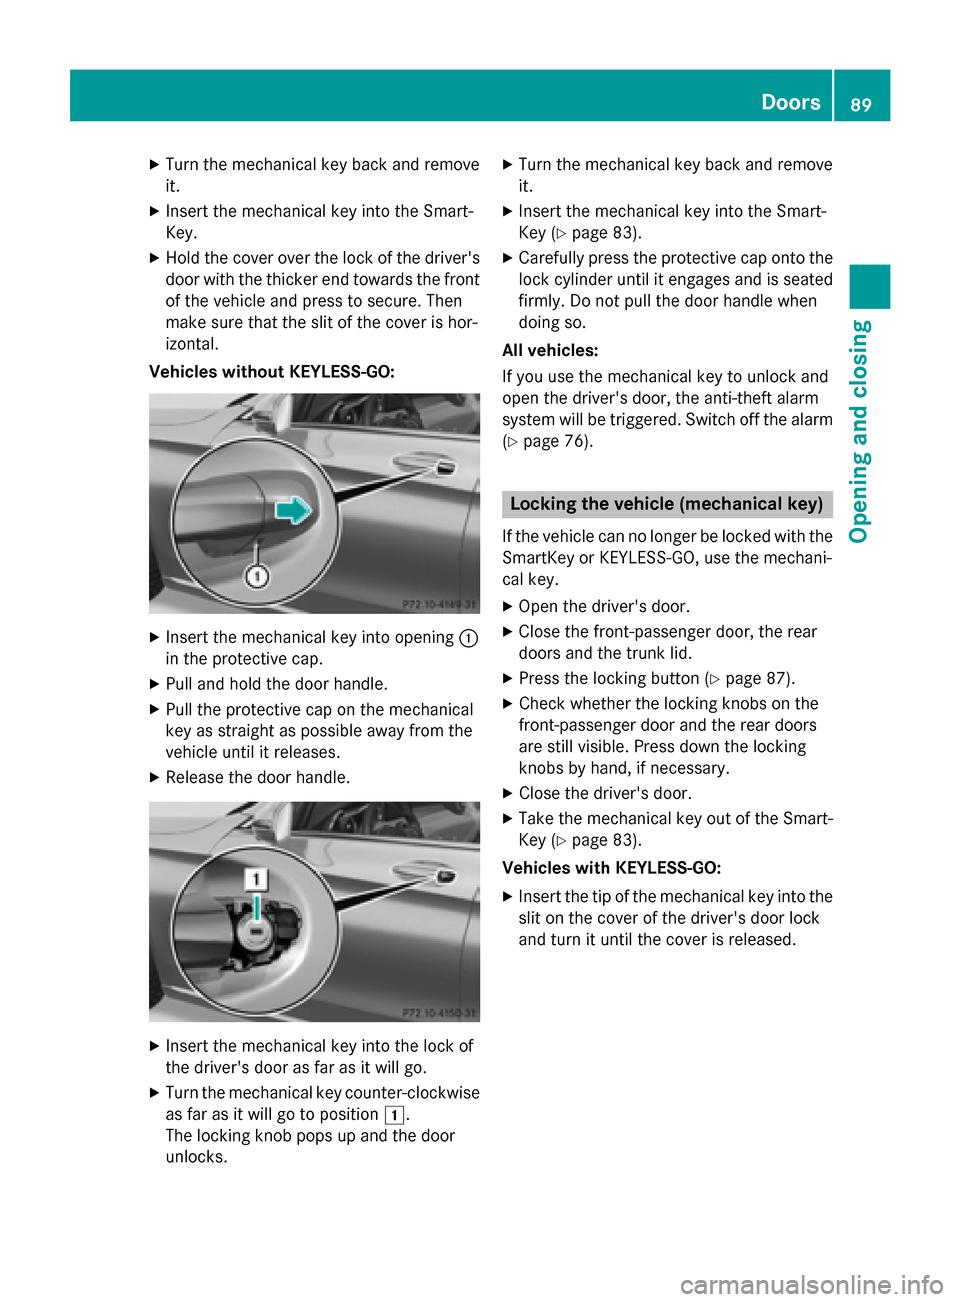 mercedes c class owners manual pdf